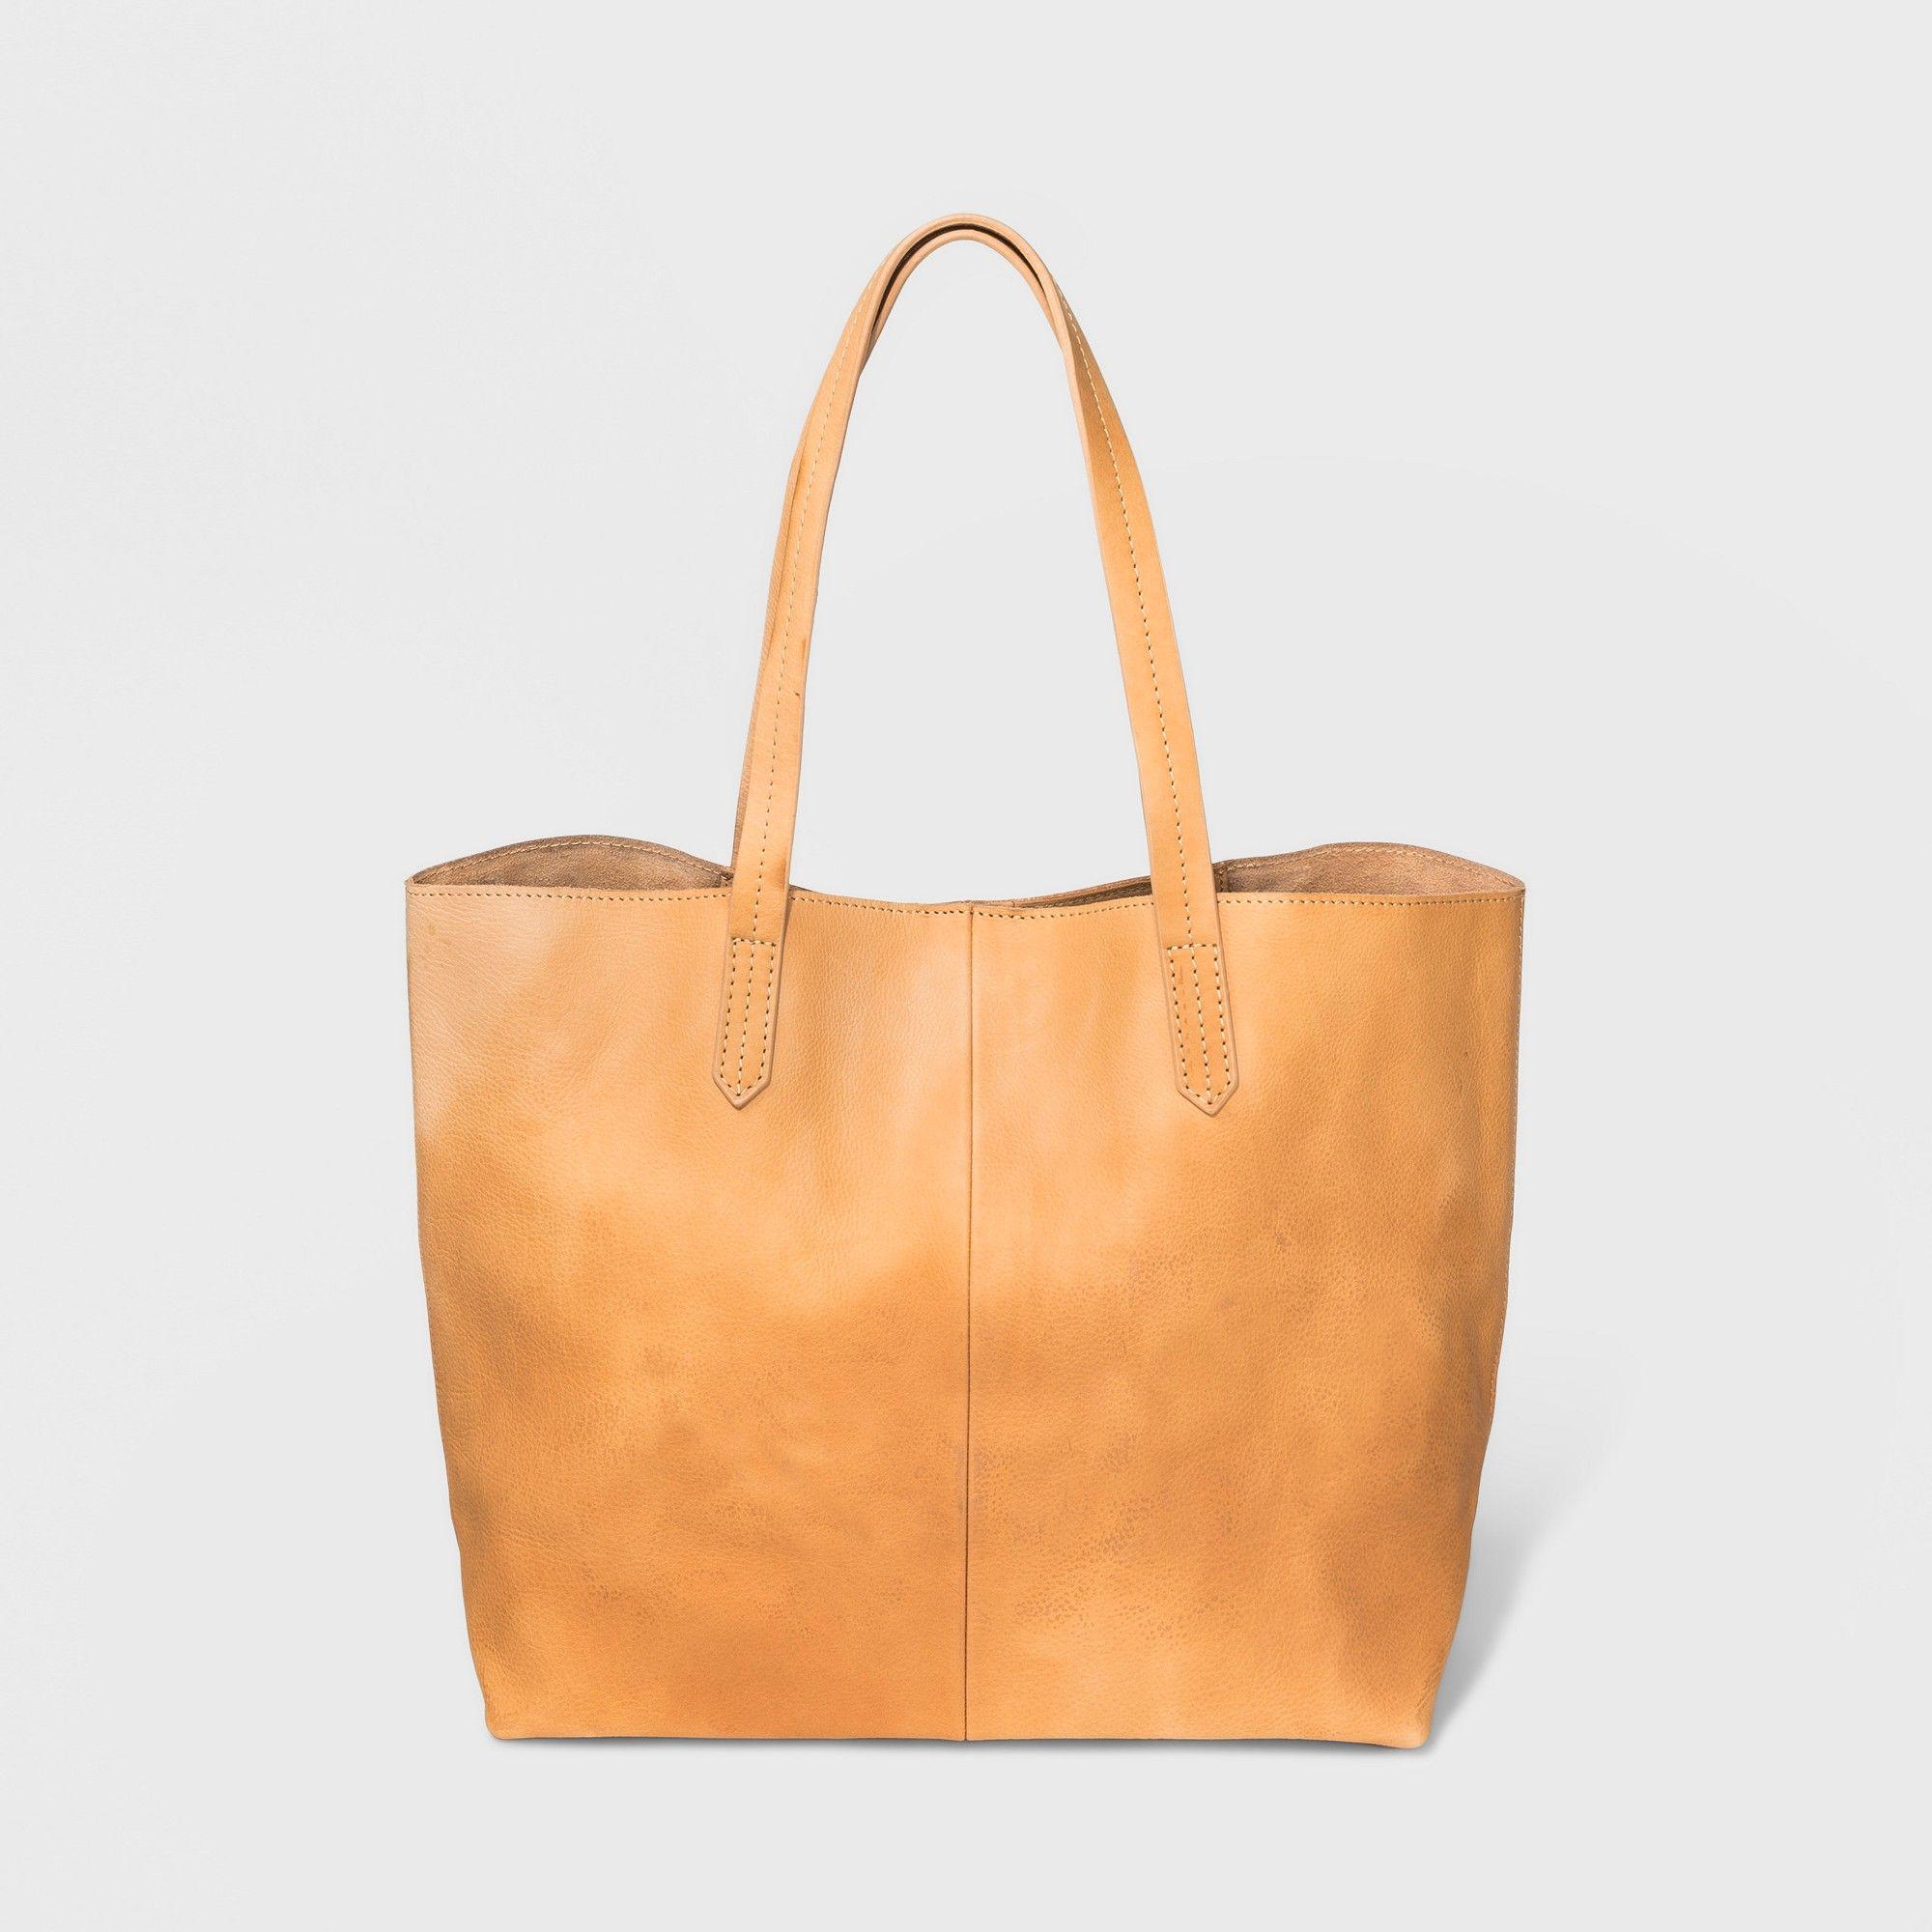 6c70a71f26b Genuine Leather Tote Handbag - Universal Thread Light Brown ...